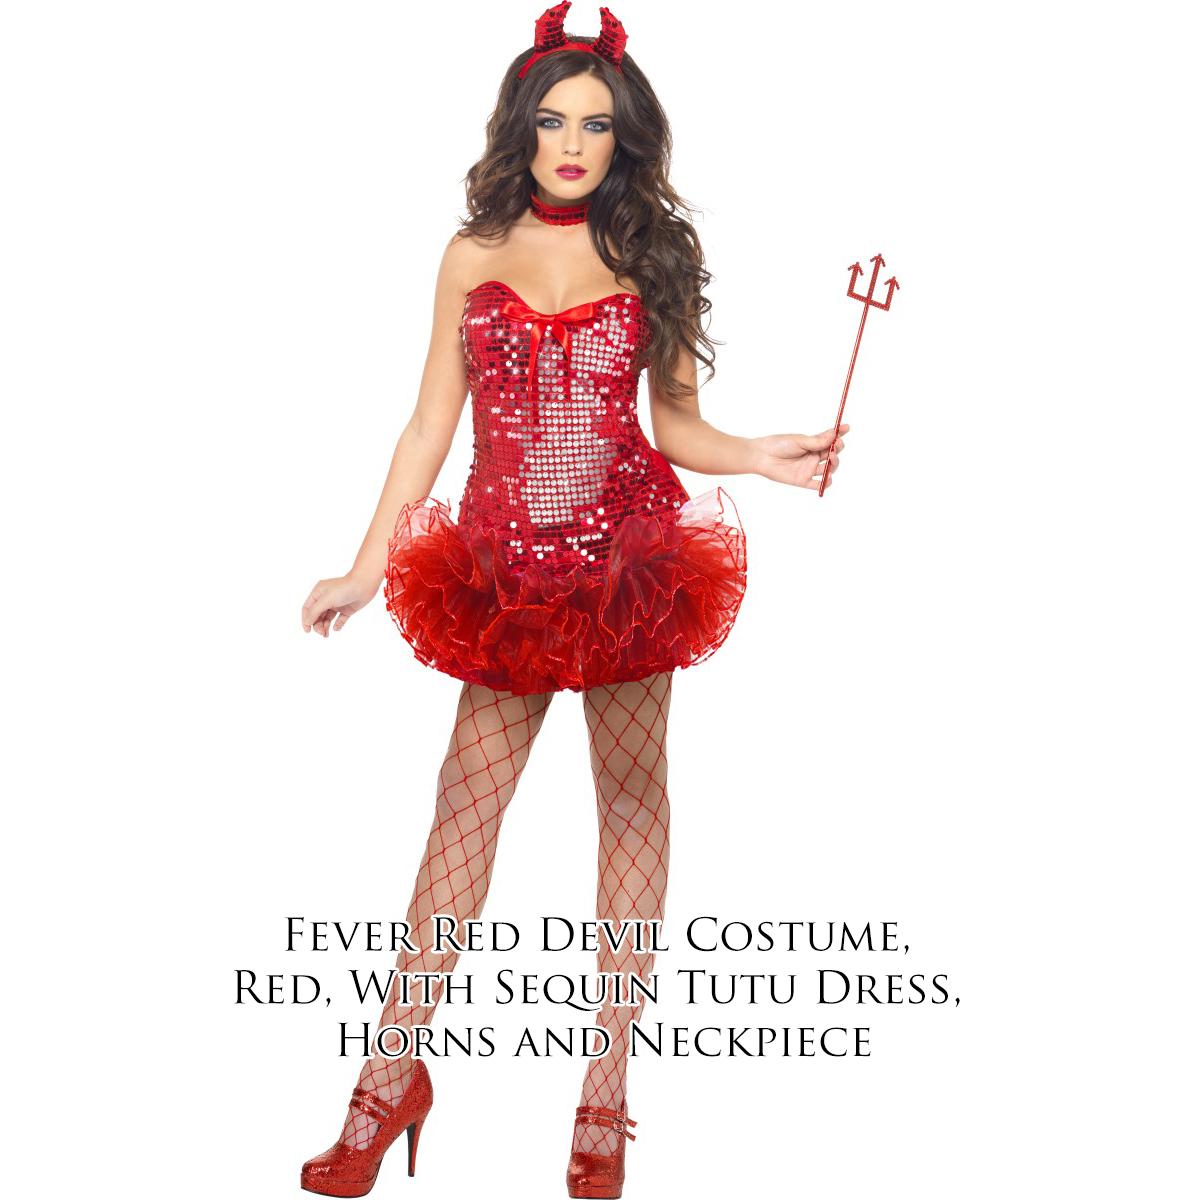 femmes halloween d guisement sexy d 39 horreur girl costume mardi gras tenue ebay. Black Bedroom Furniture Sets. Home Design Ideas